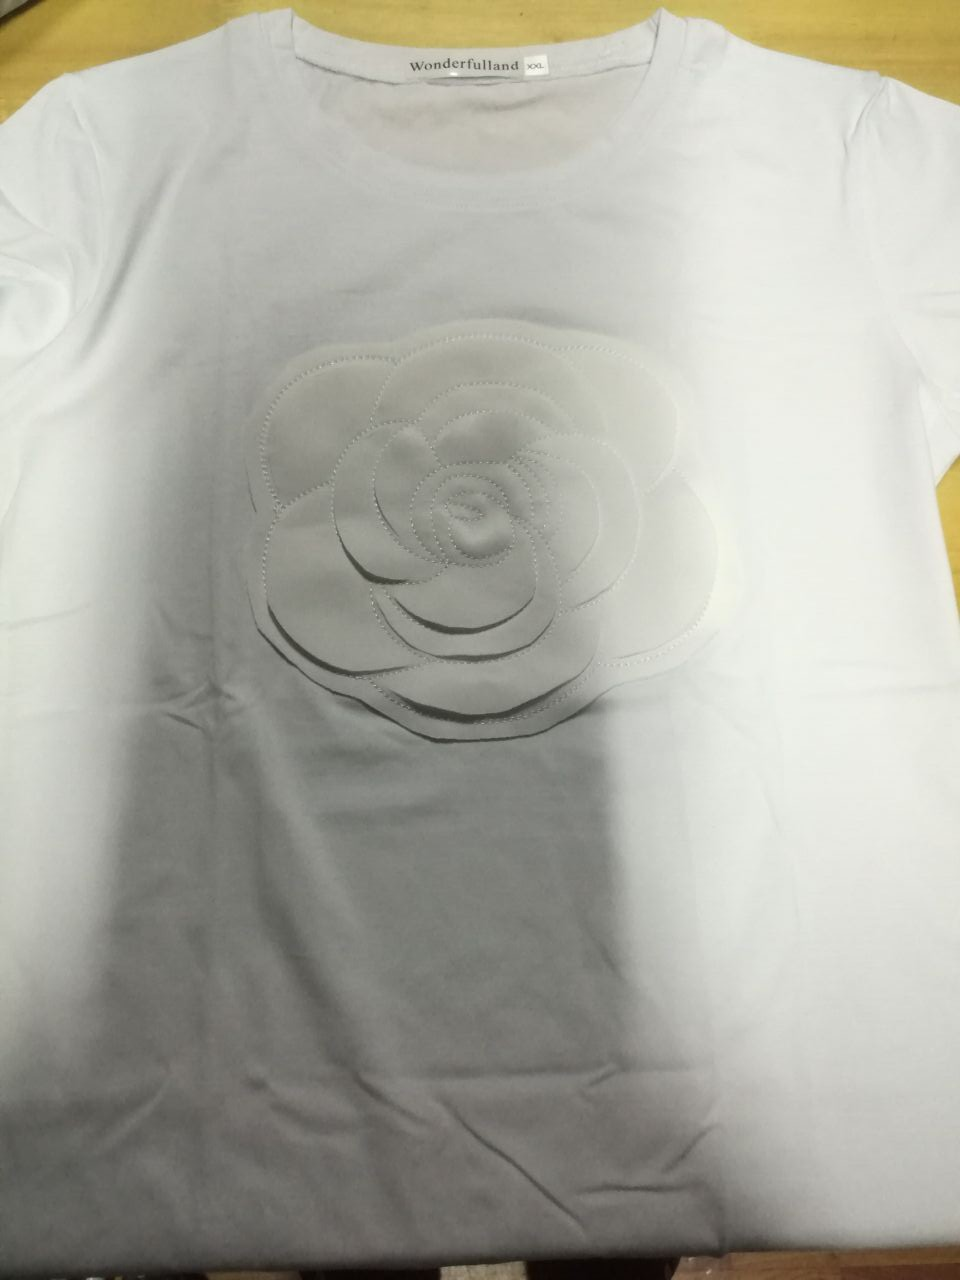 HTB1BCoNQpXXXXXEaXXXq6xXFXXXU - Wonderfulland women summer 3d camellia embroidery luxury T-shirt